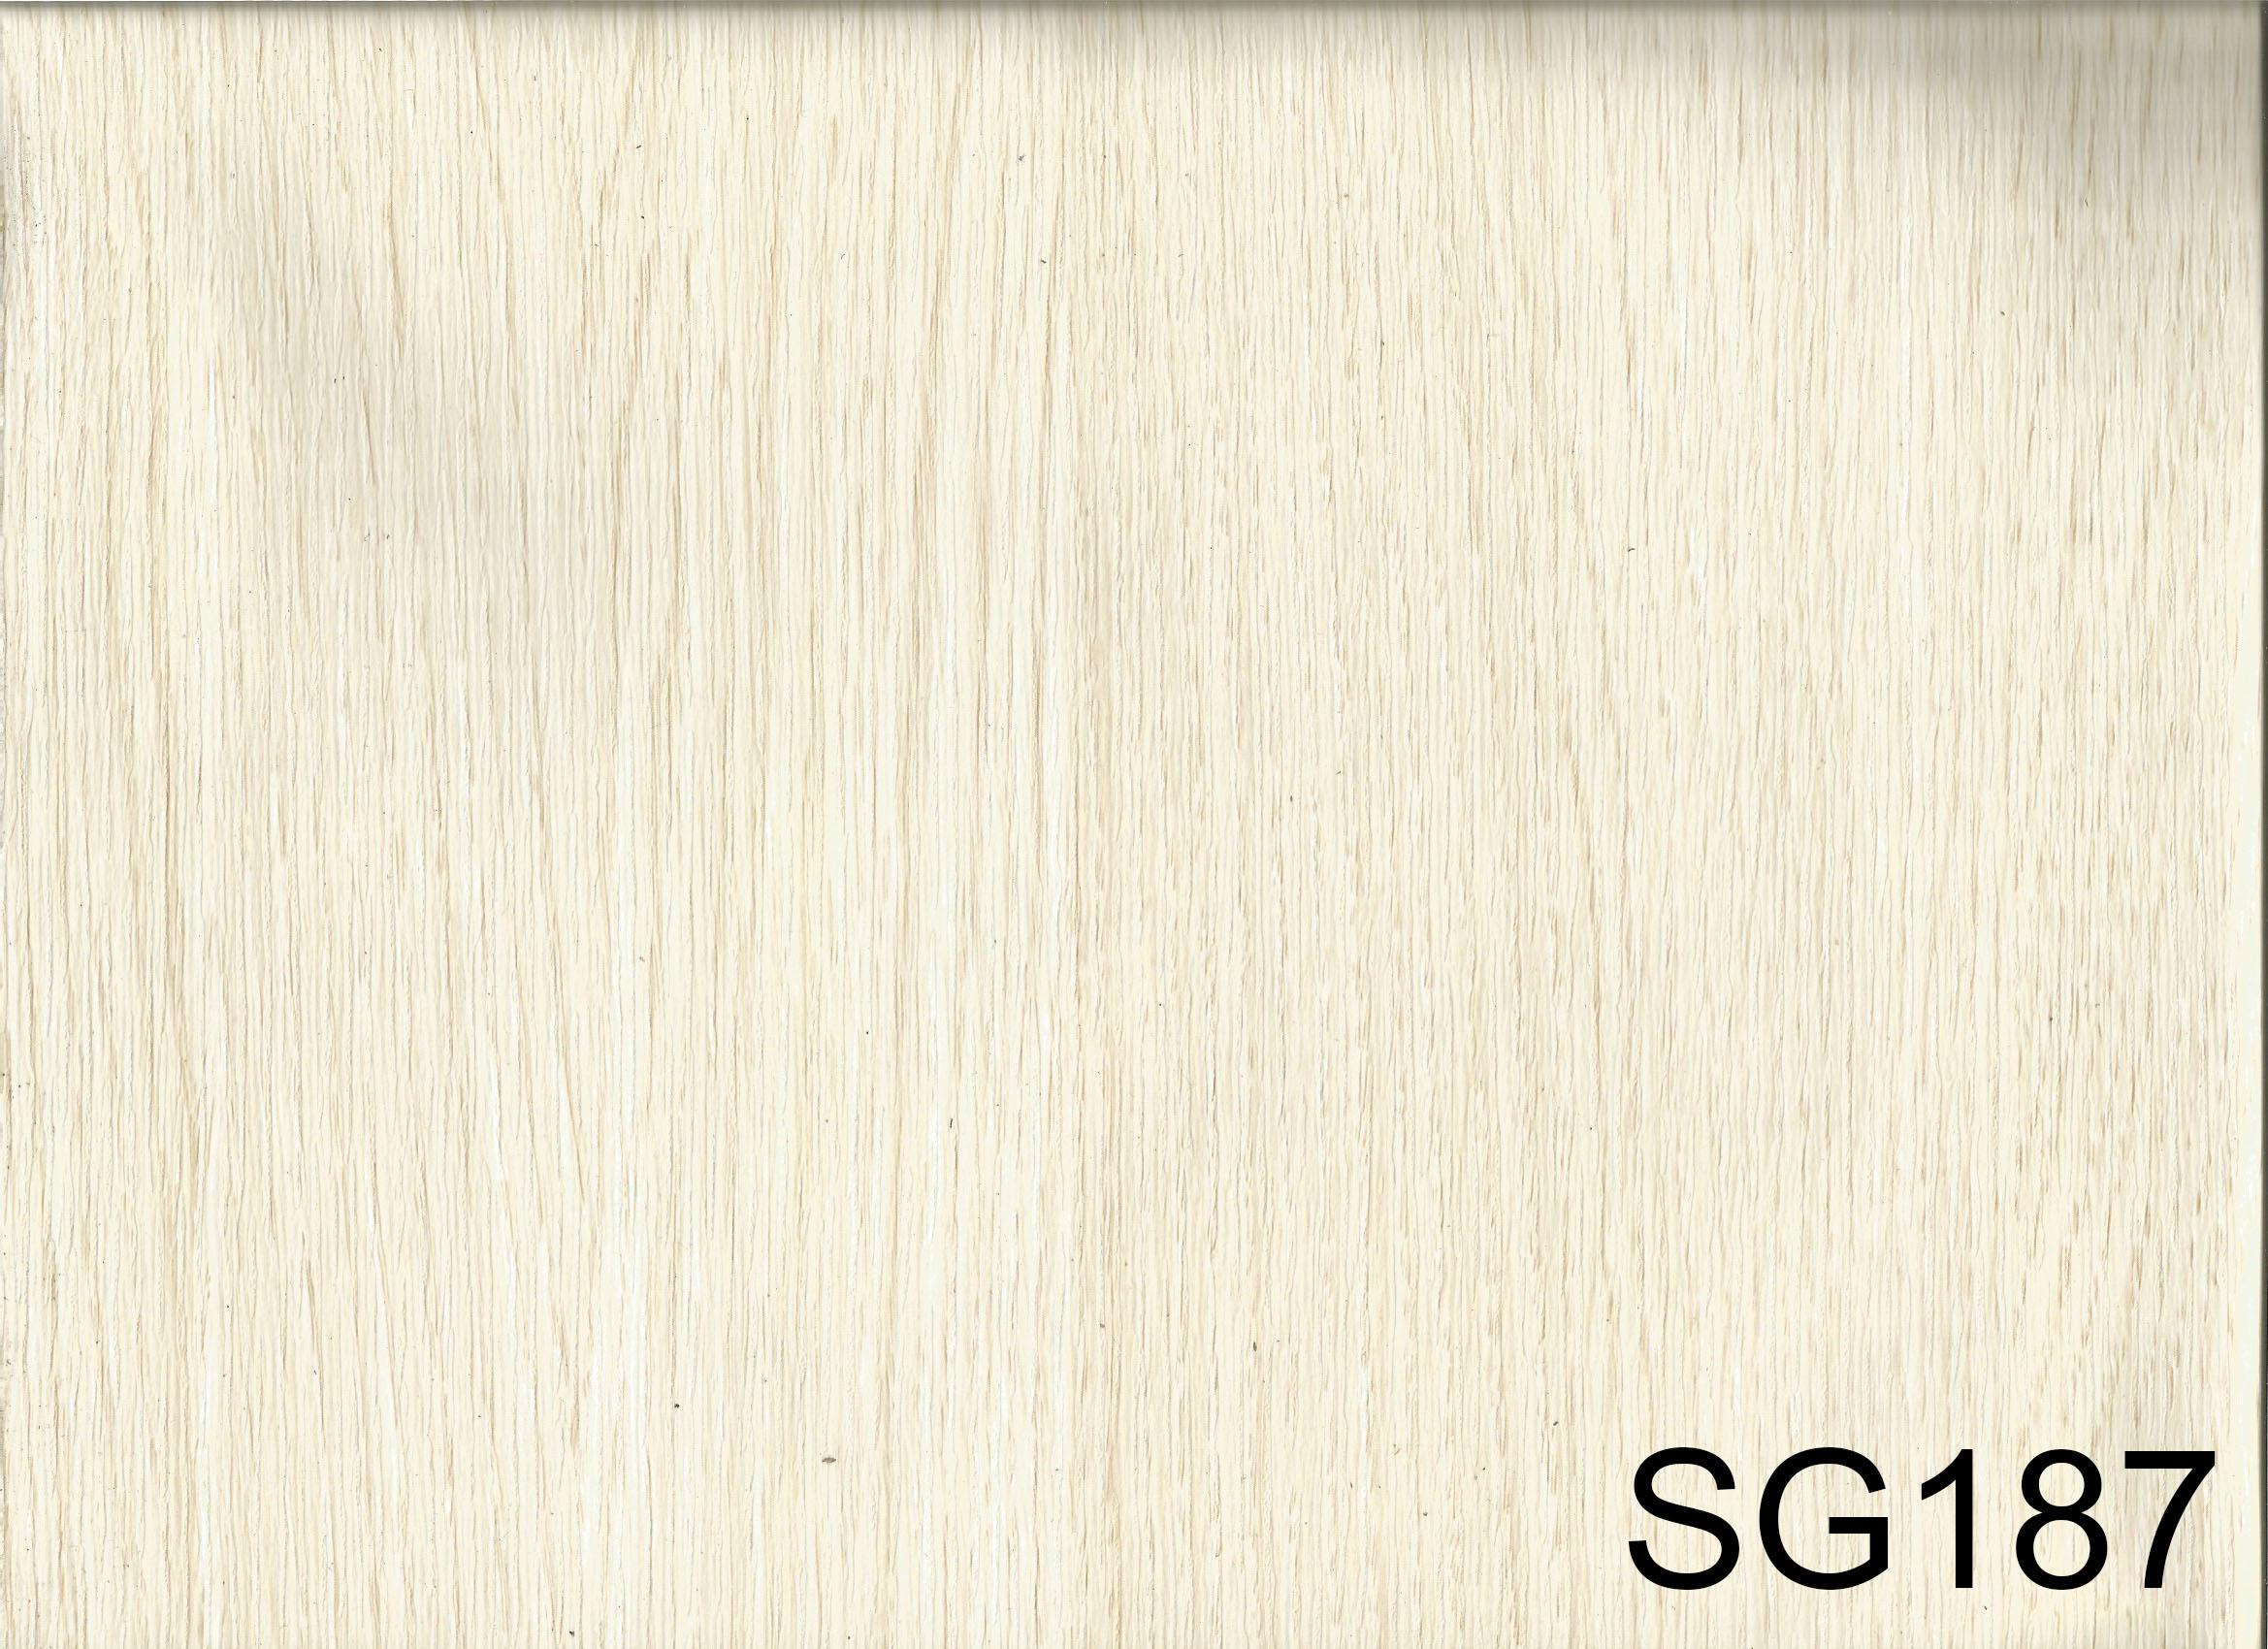 SG187